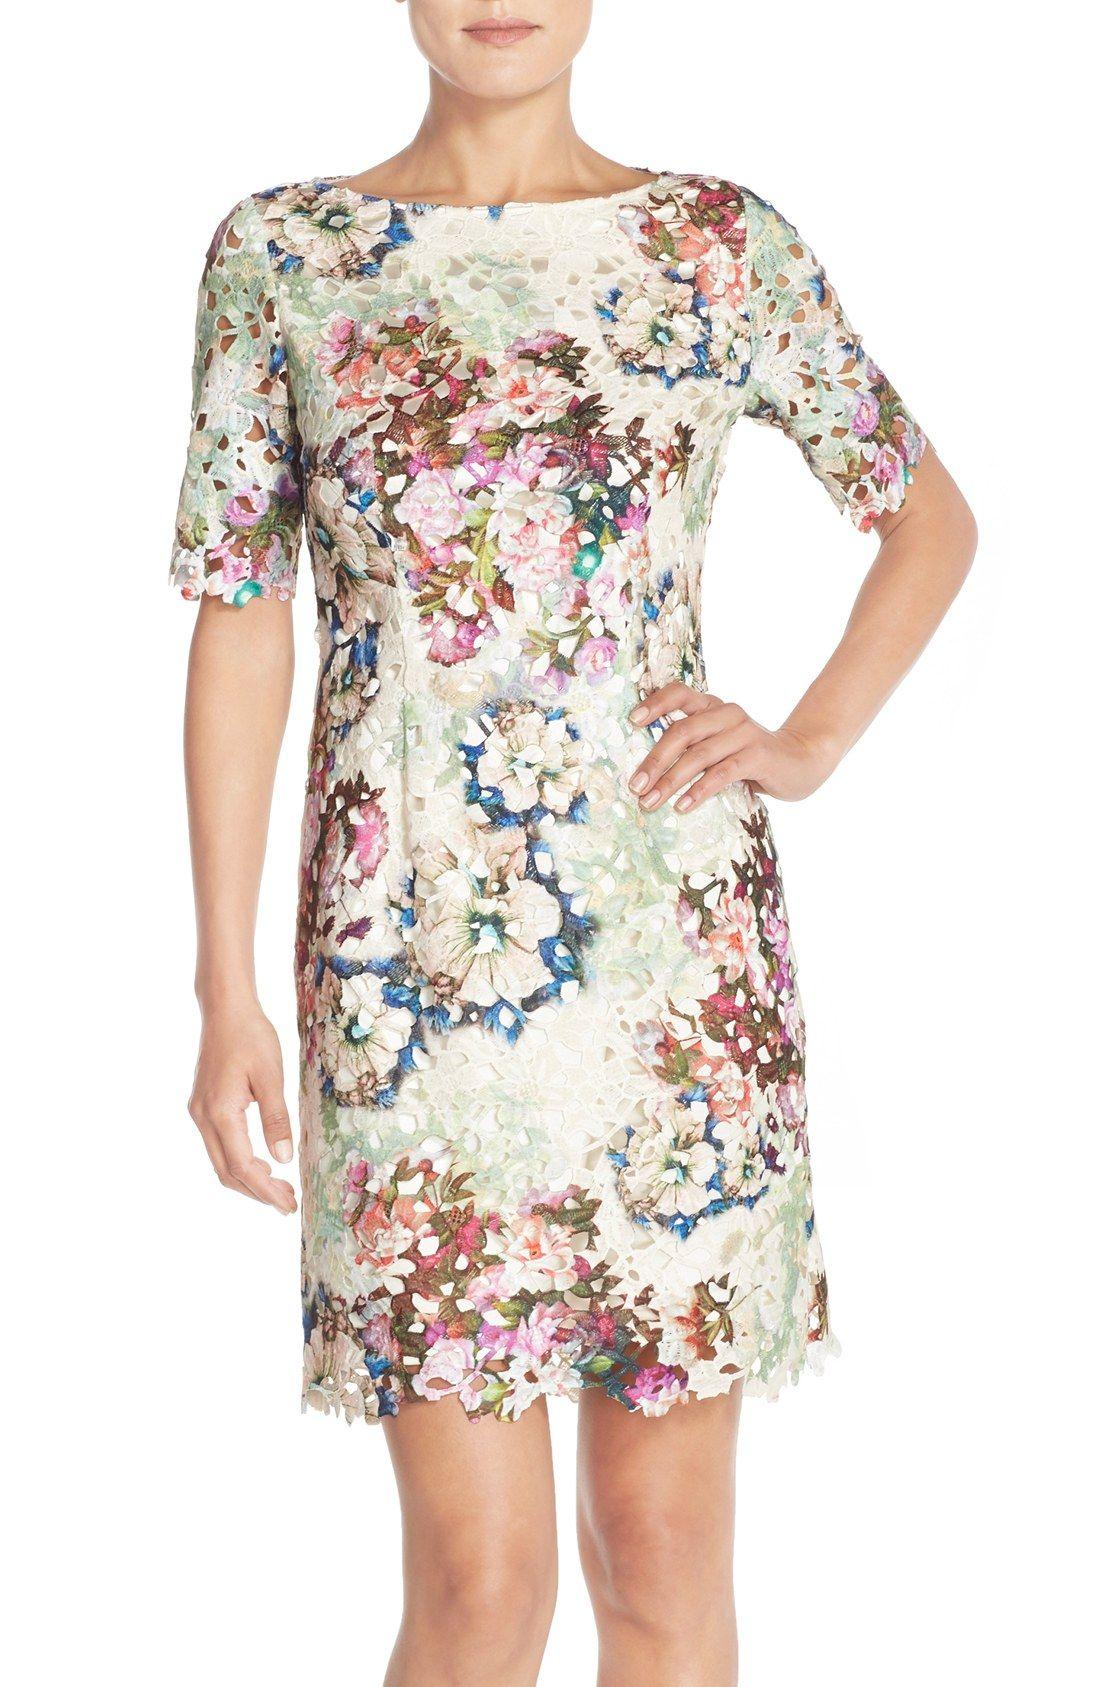 Tahari Floral Print Lace Sheath Dress Regular Petite Nordstrom Lace Sheath Dress Work Dresses With Sleeves Dresses [ 1687 x 1100 Pixel ]